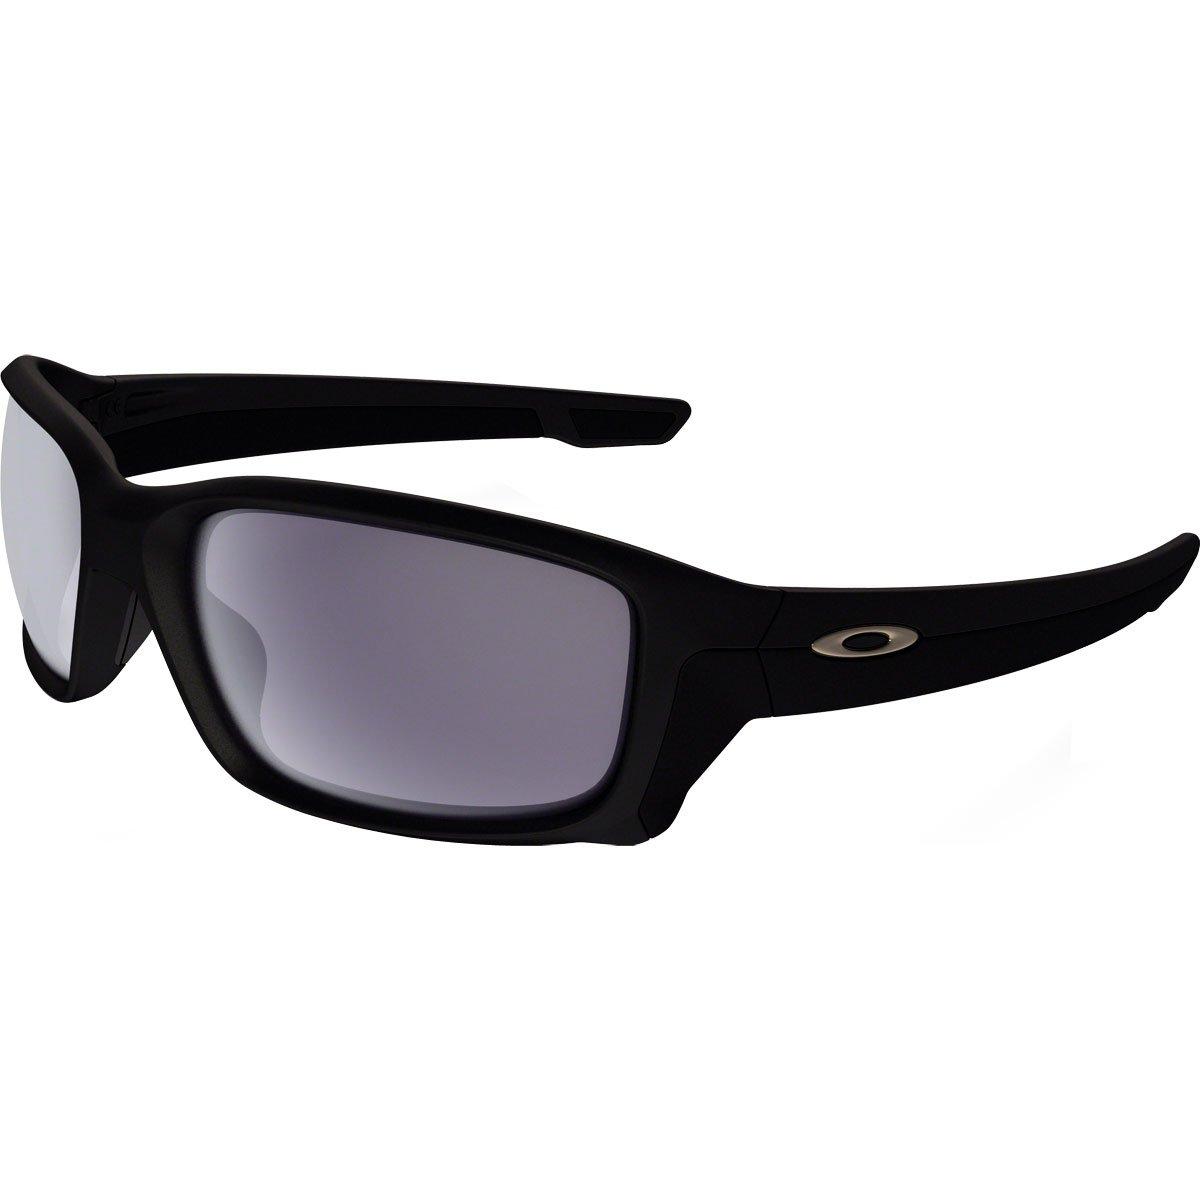 TALLA 58. Oakley Gafas de Sol Straightlink (58 mm)